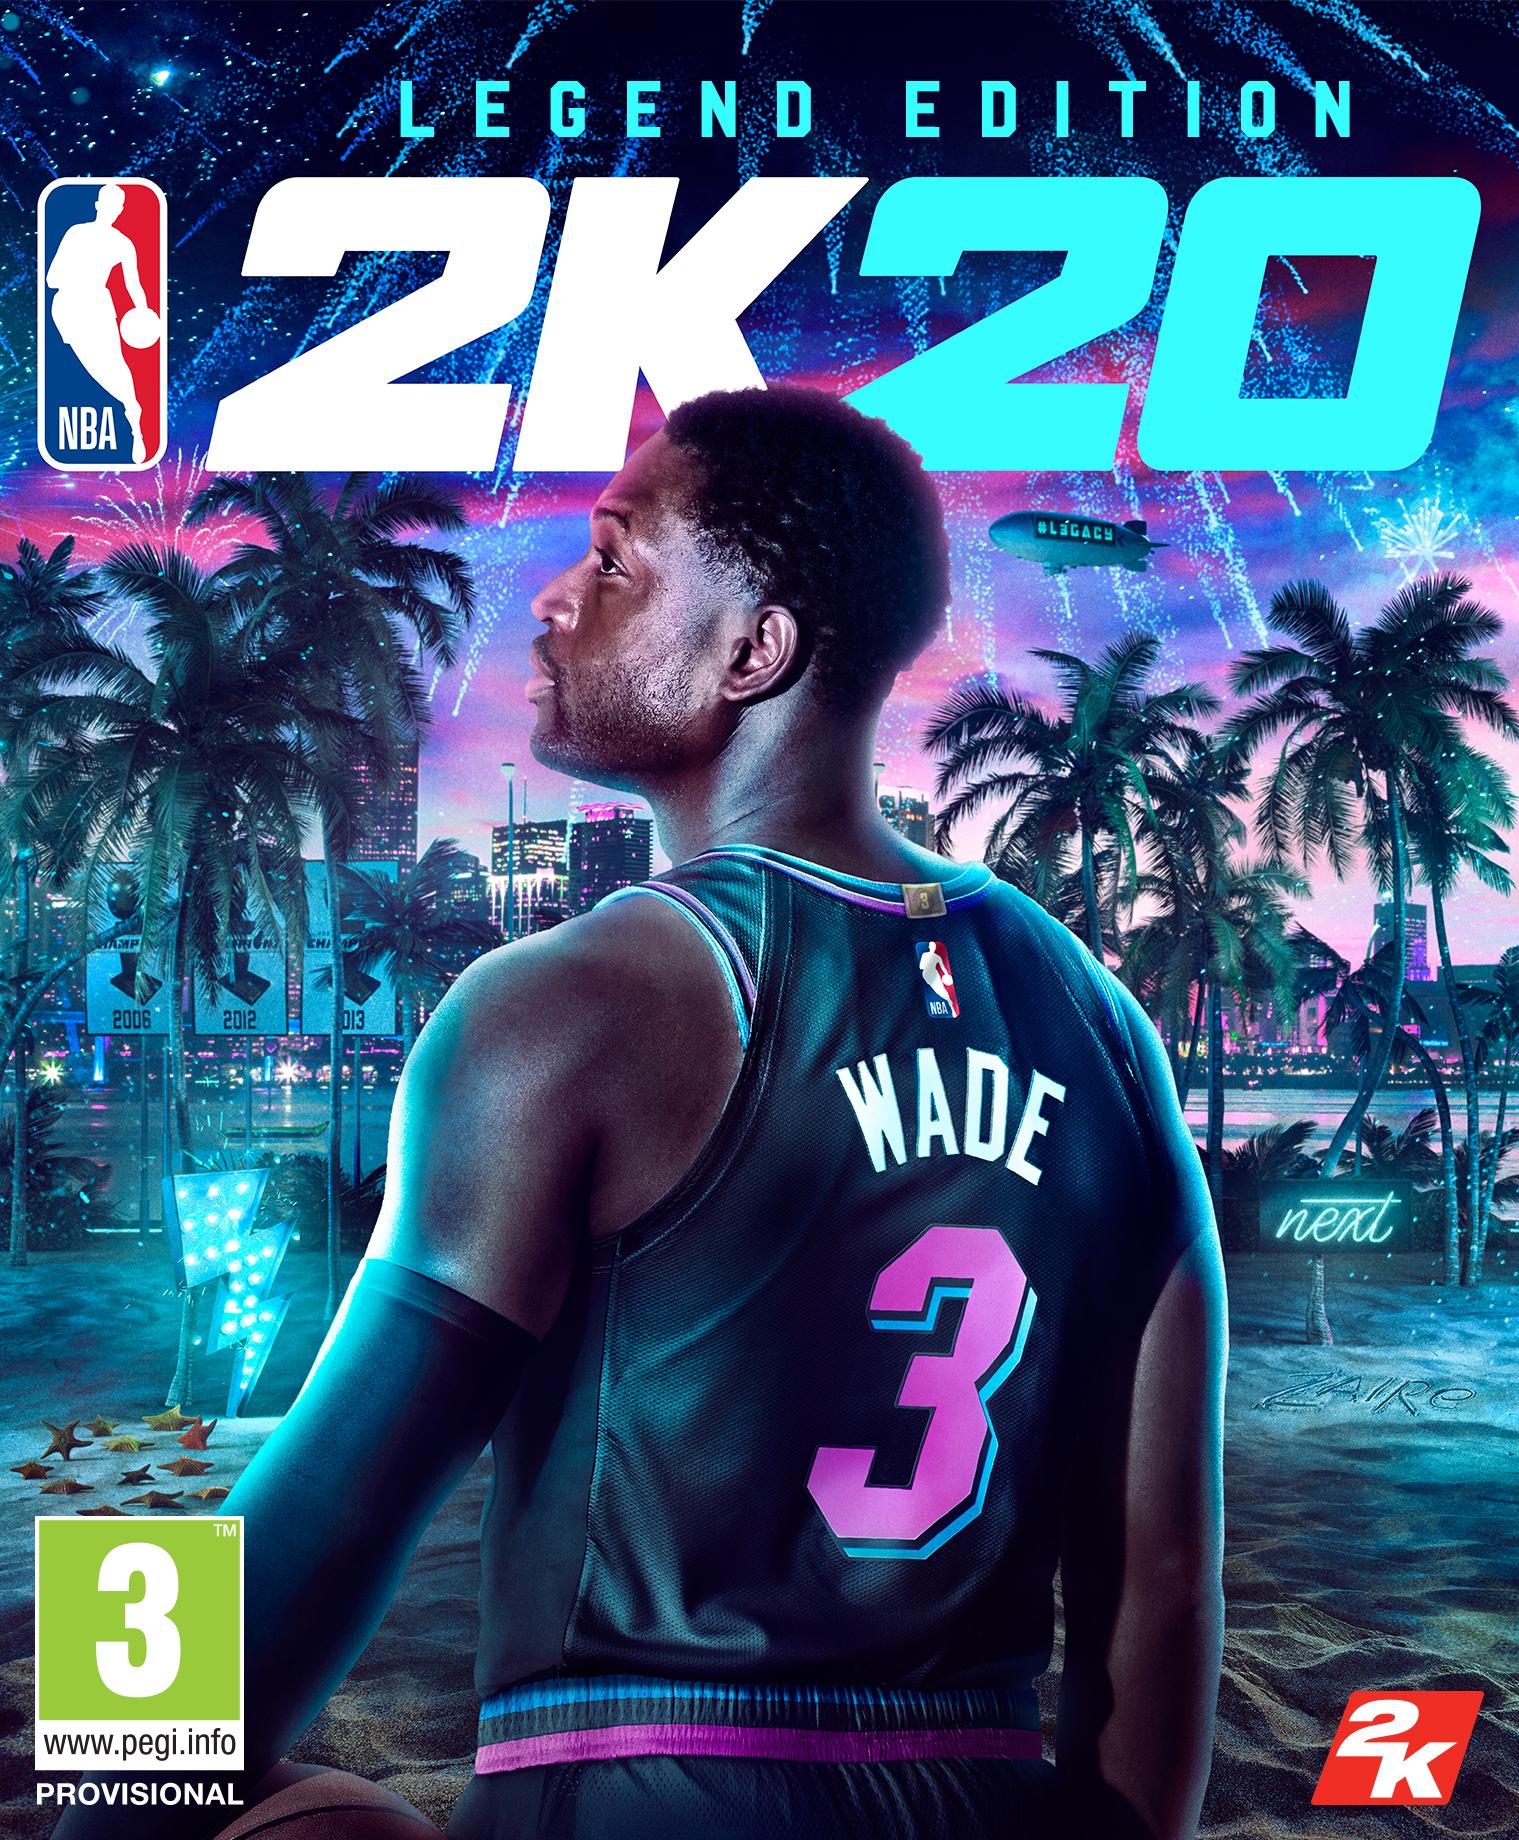 NBA 2K20 Legend Edition (PC) DIGITÁLIS (Steam kulcs)